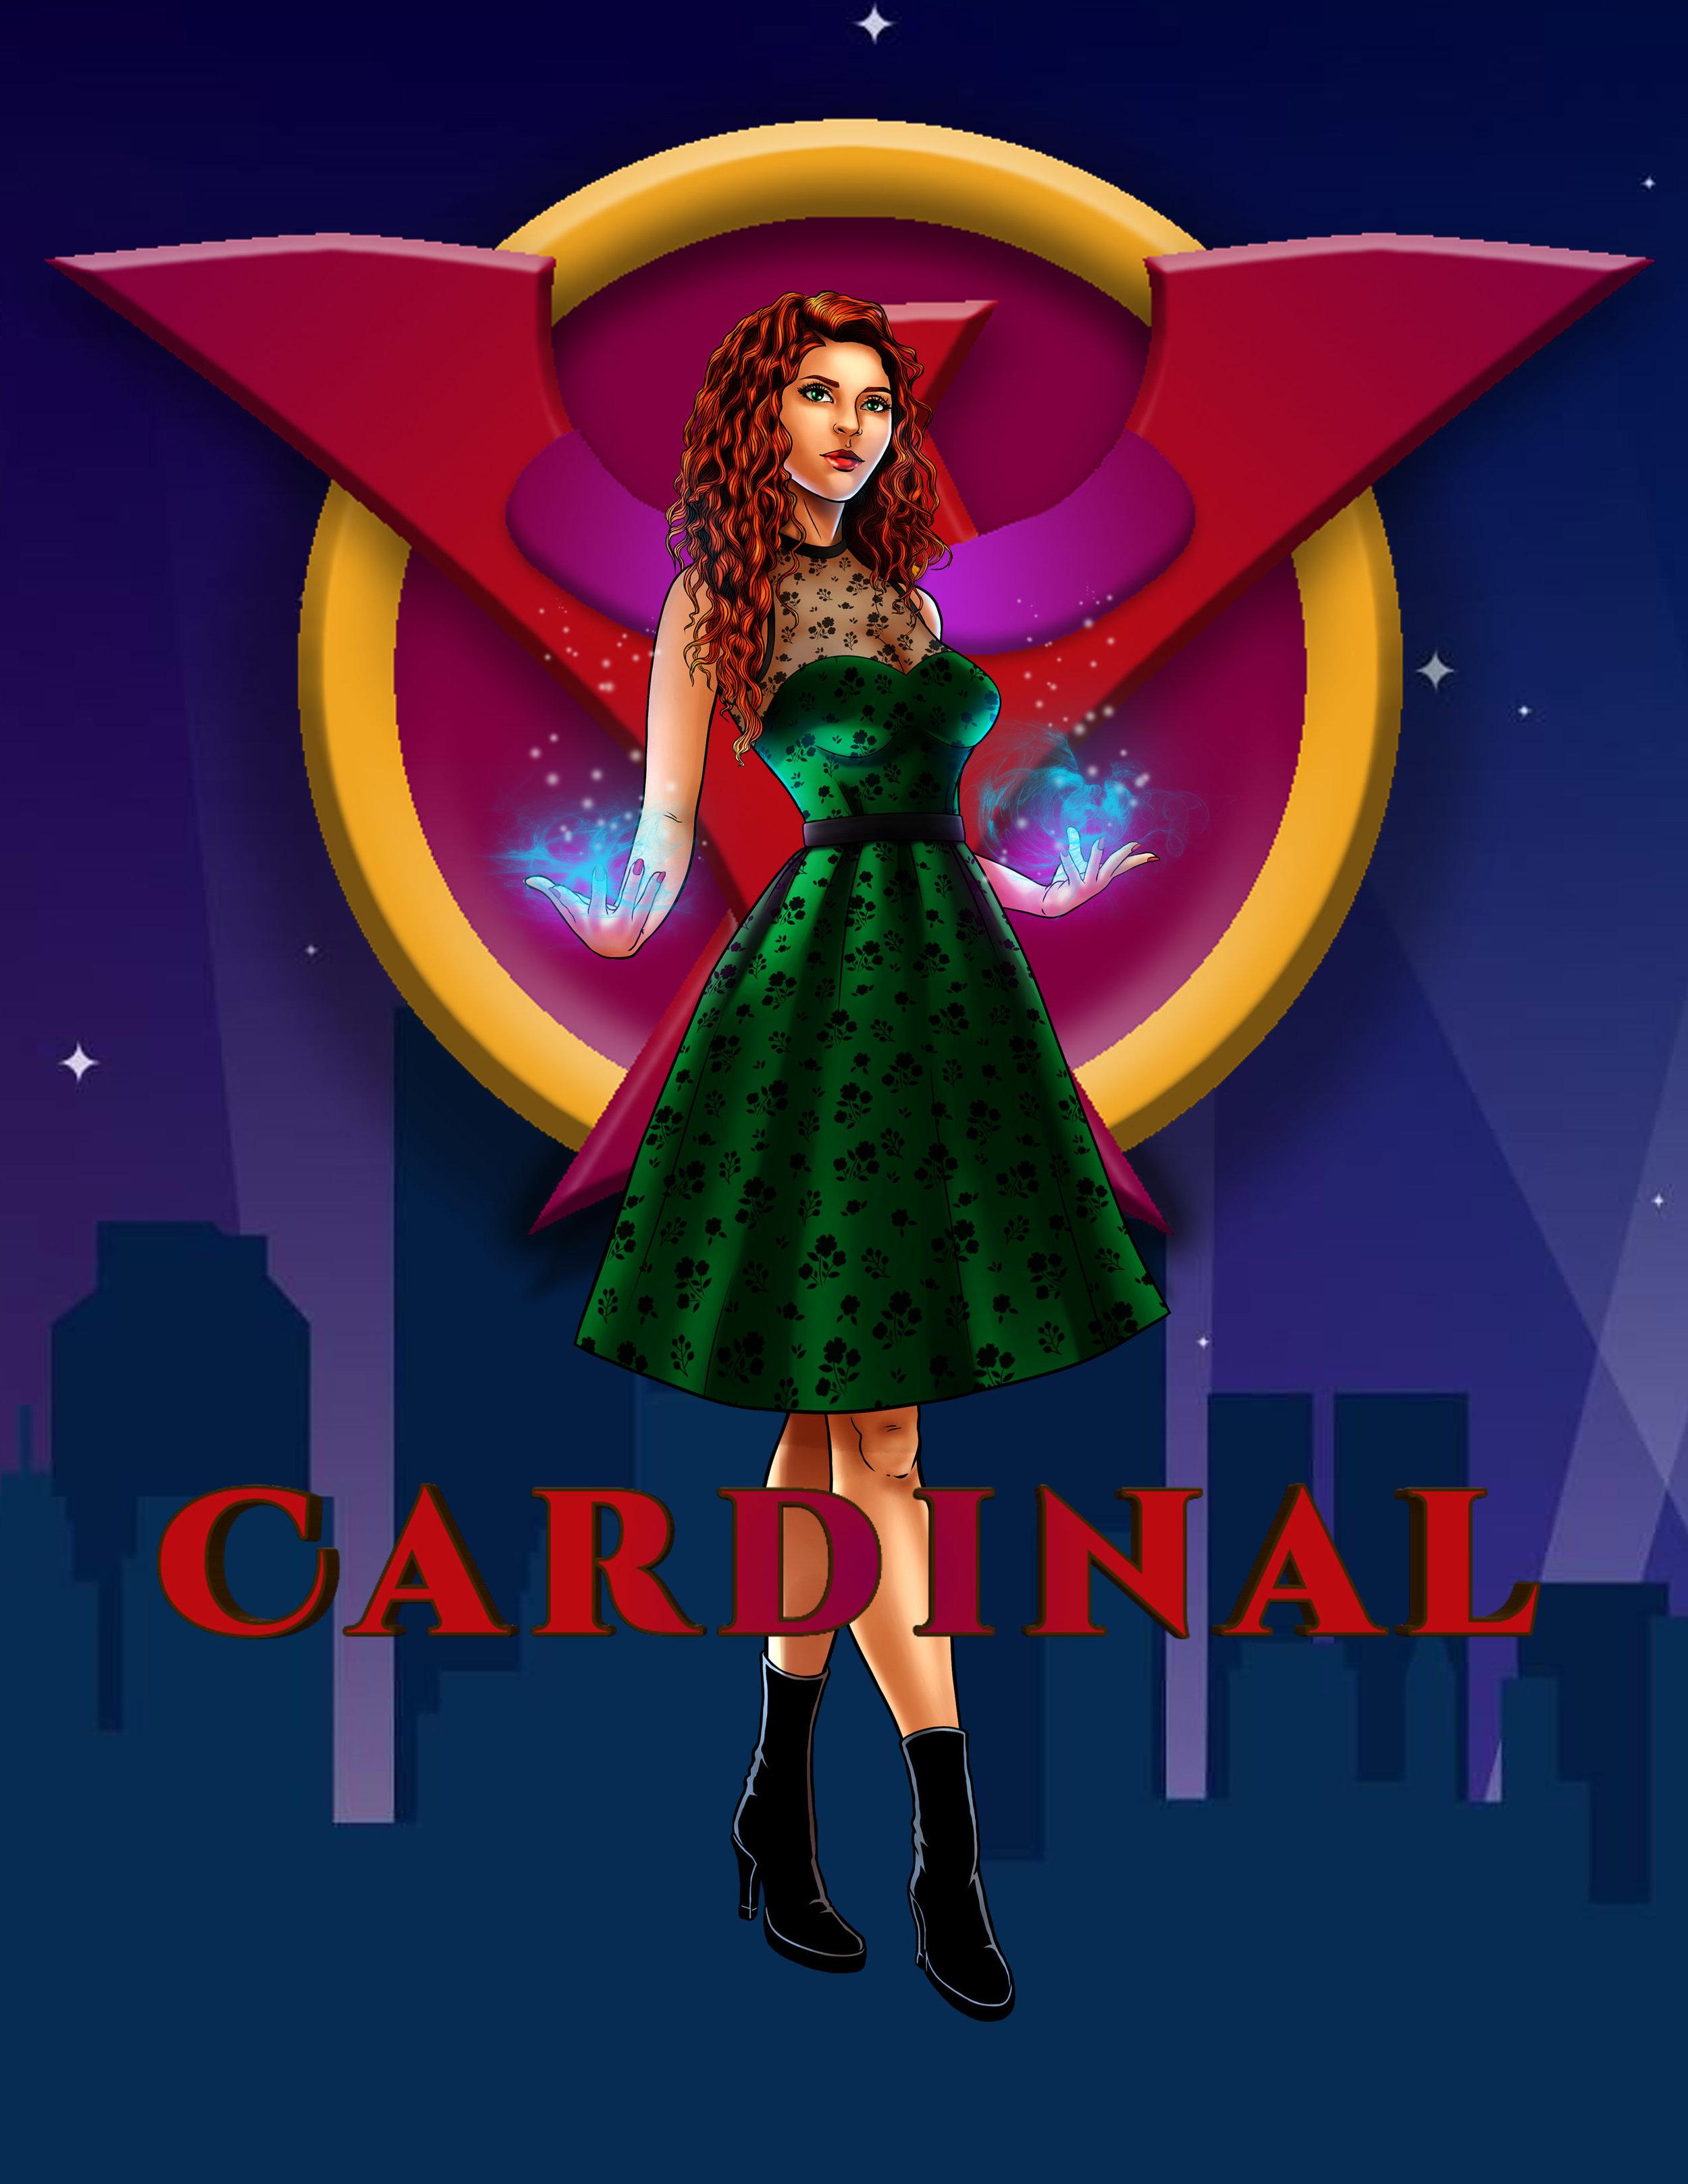 Scarlett Cardinal